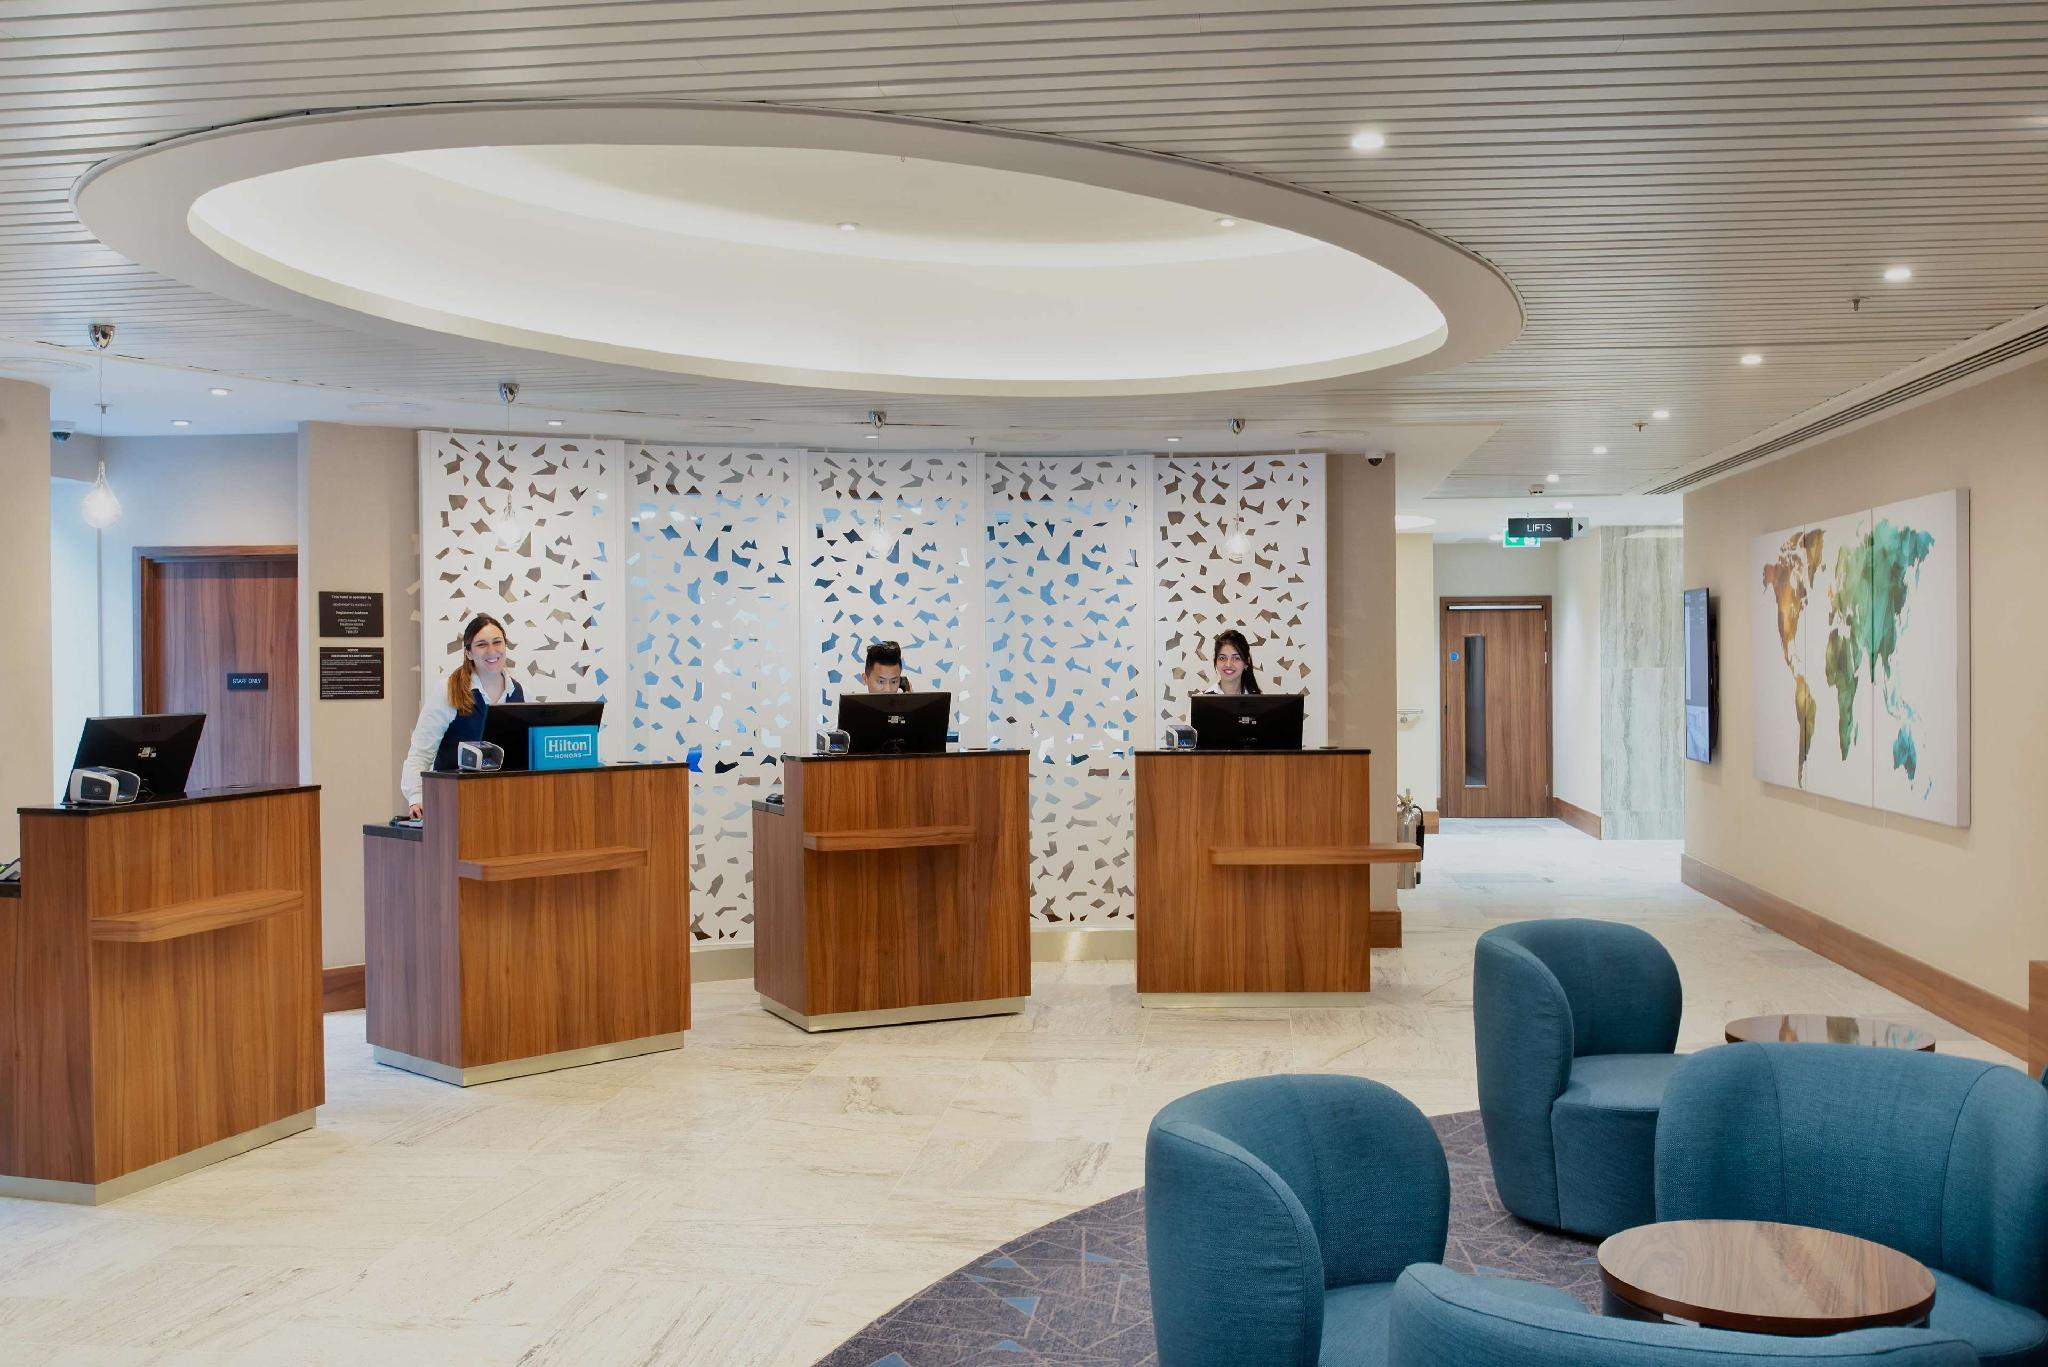 Hilton Garden Inn London Heathrow Terminals 2 and